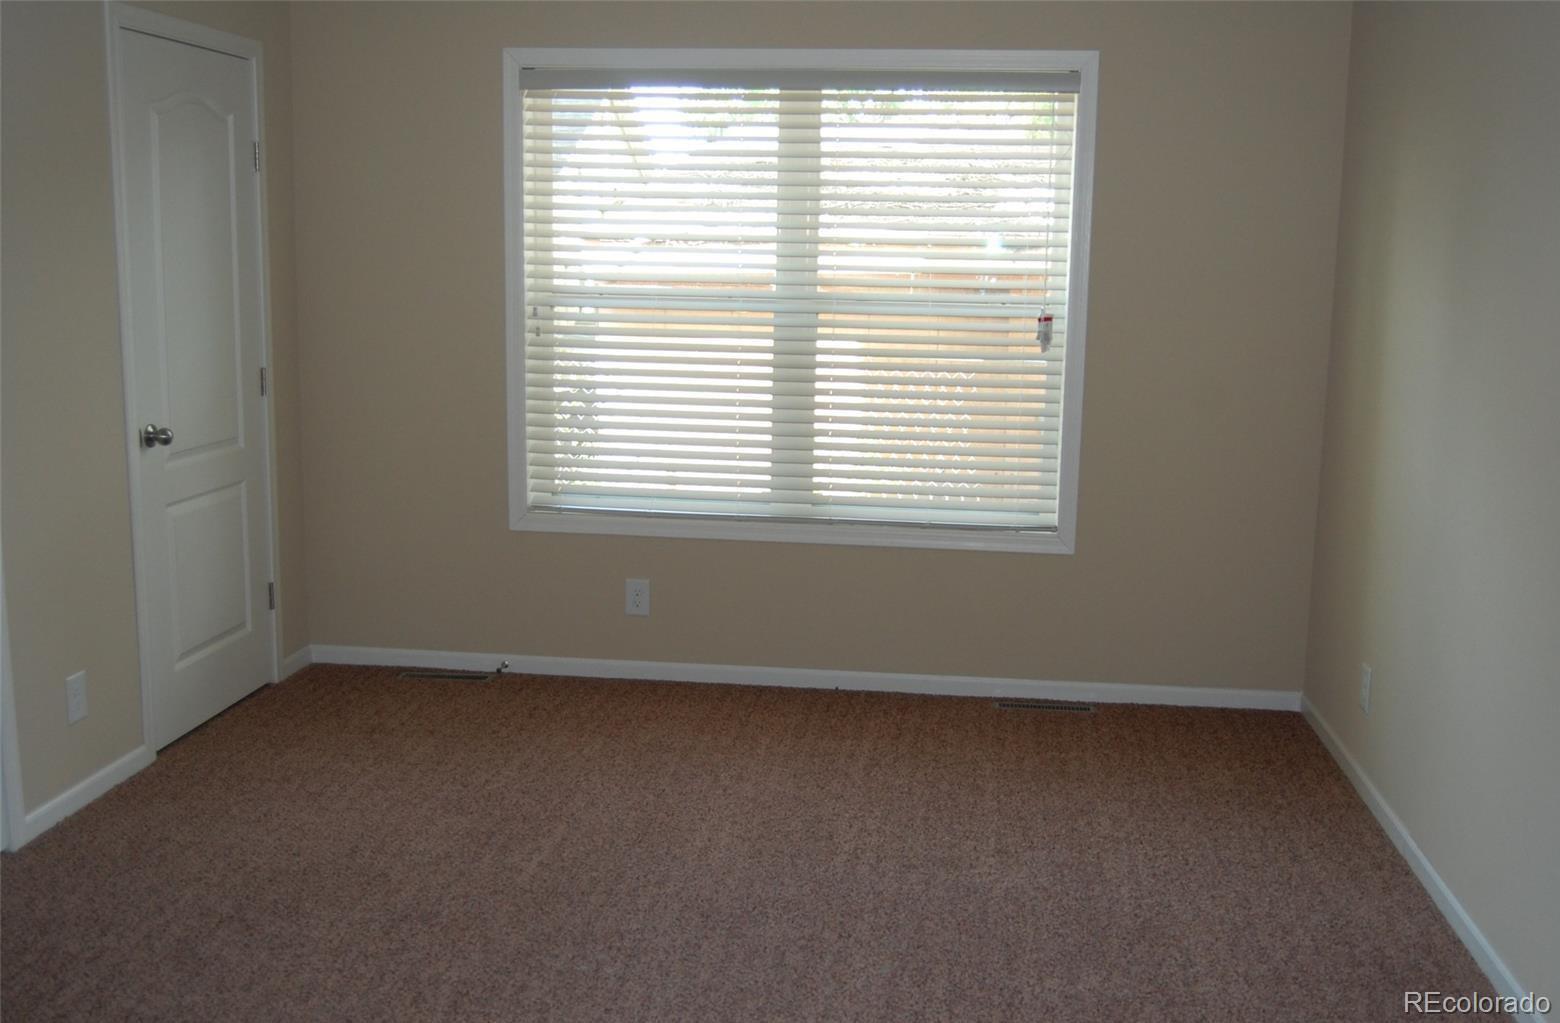 MLS# 9171580 - 9 - 426 Cheyenne Street, Kiowa, CO 80117